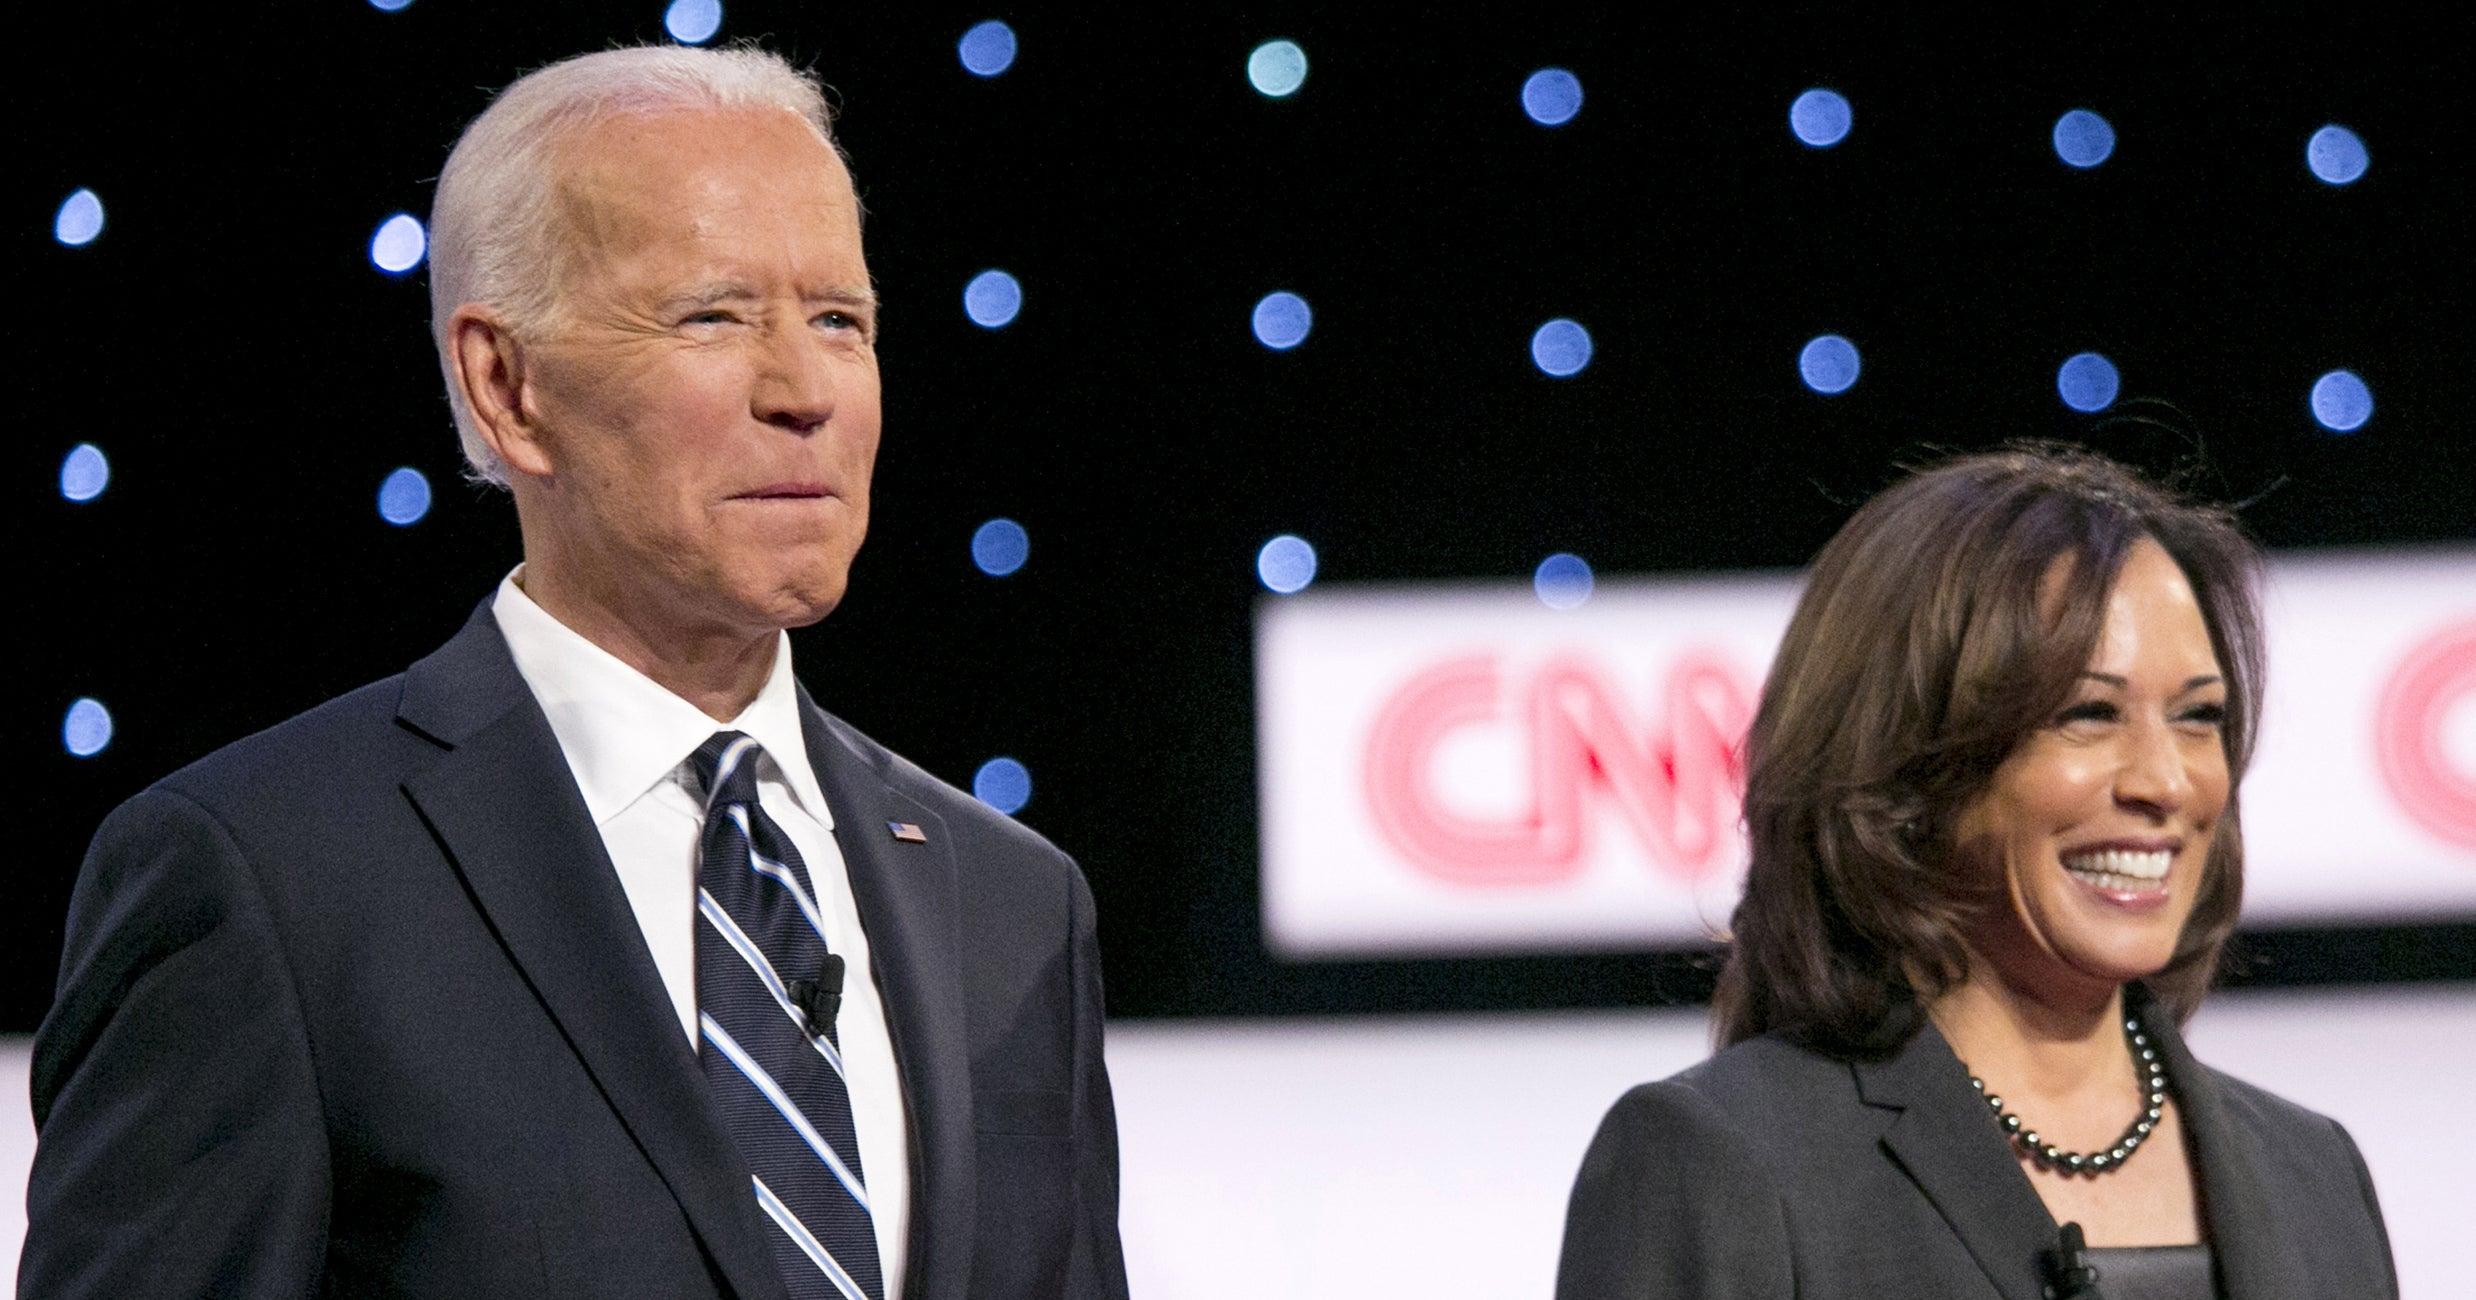 Biden's Notes Reveal What He Thinks Of Kamala Harris